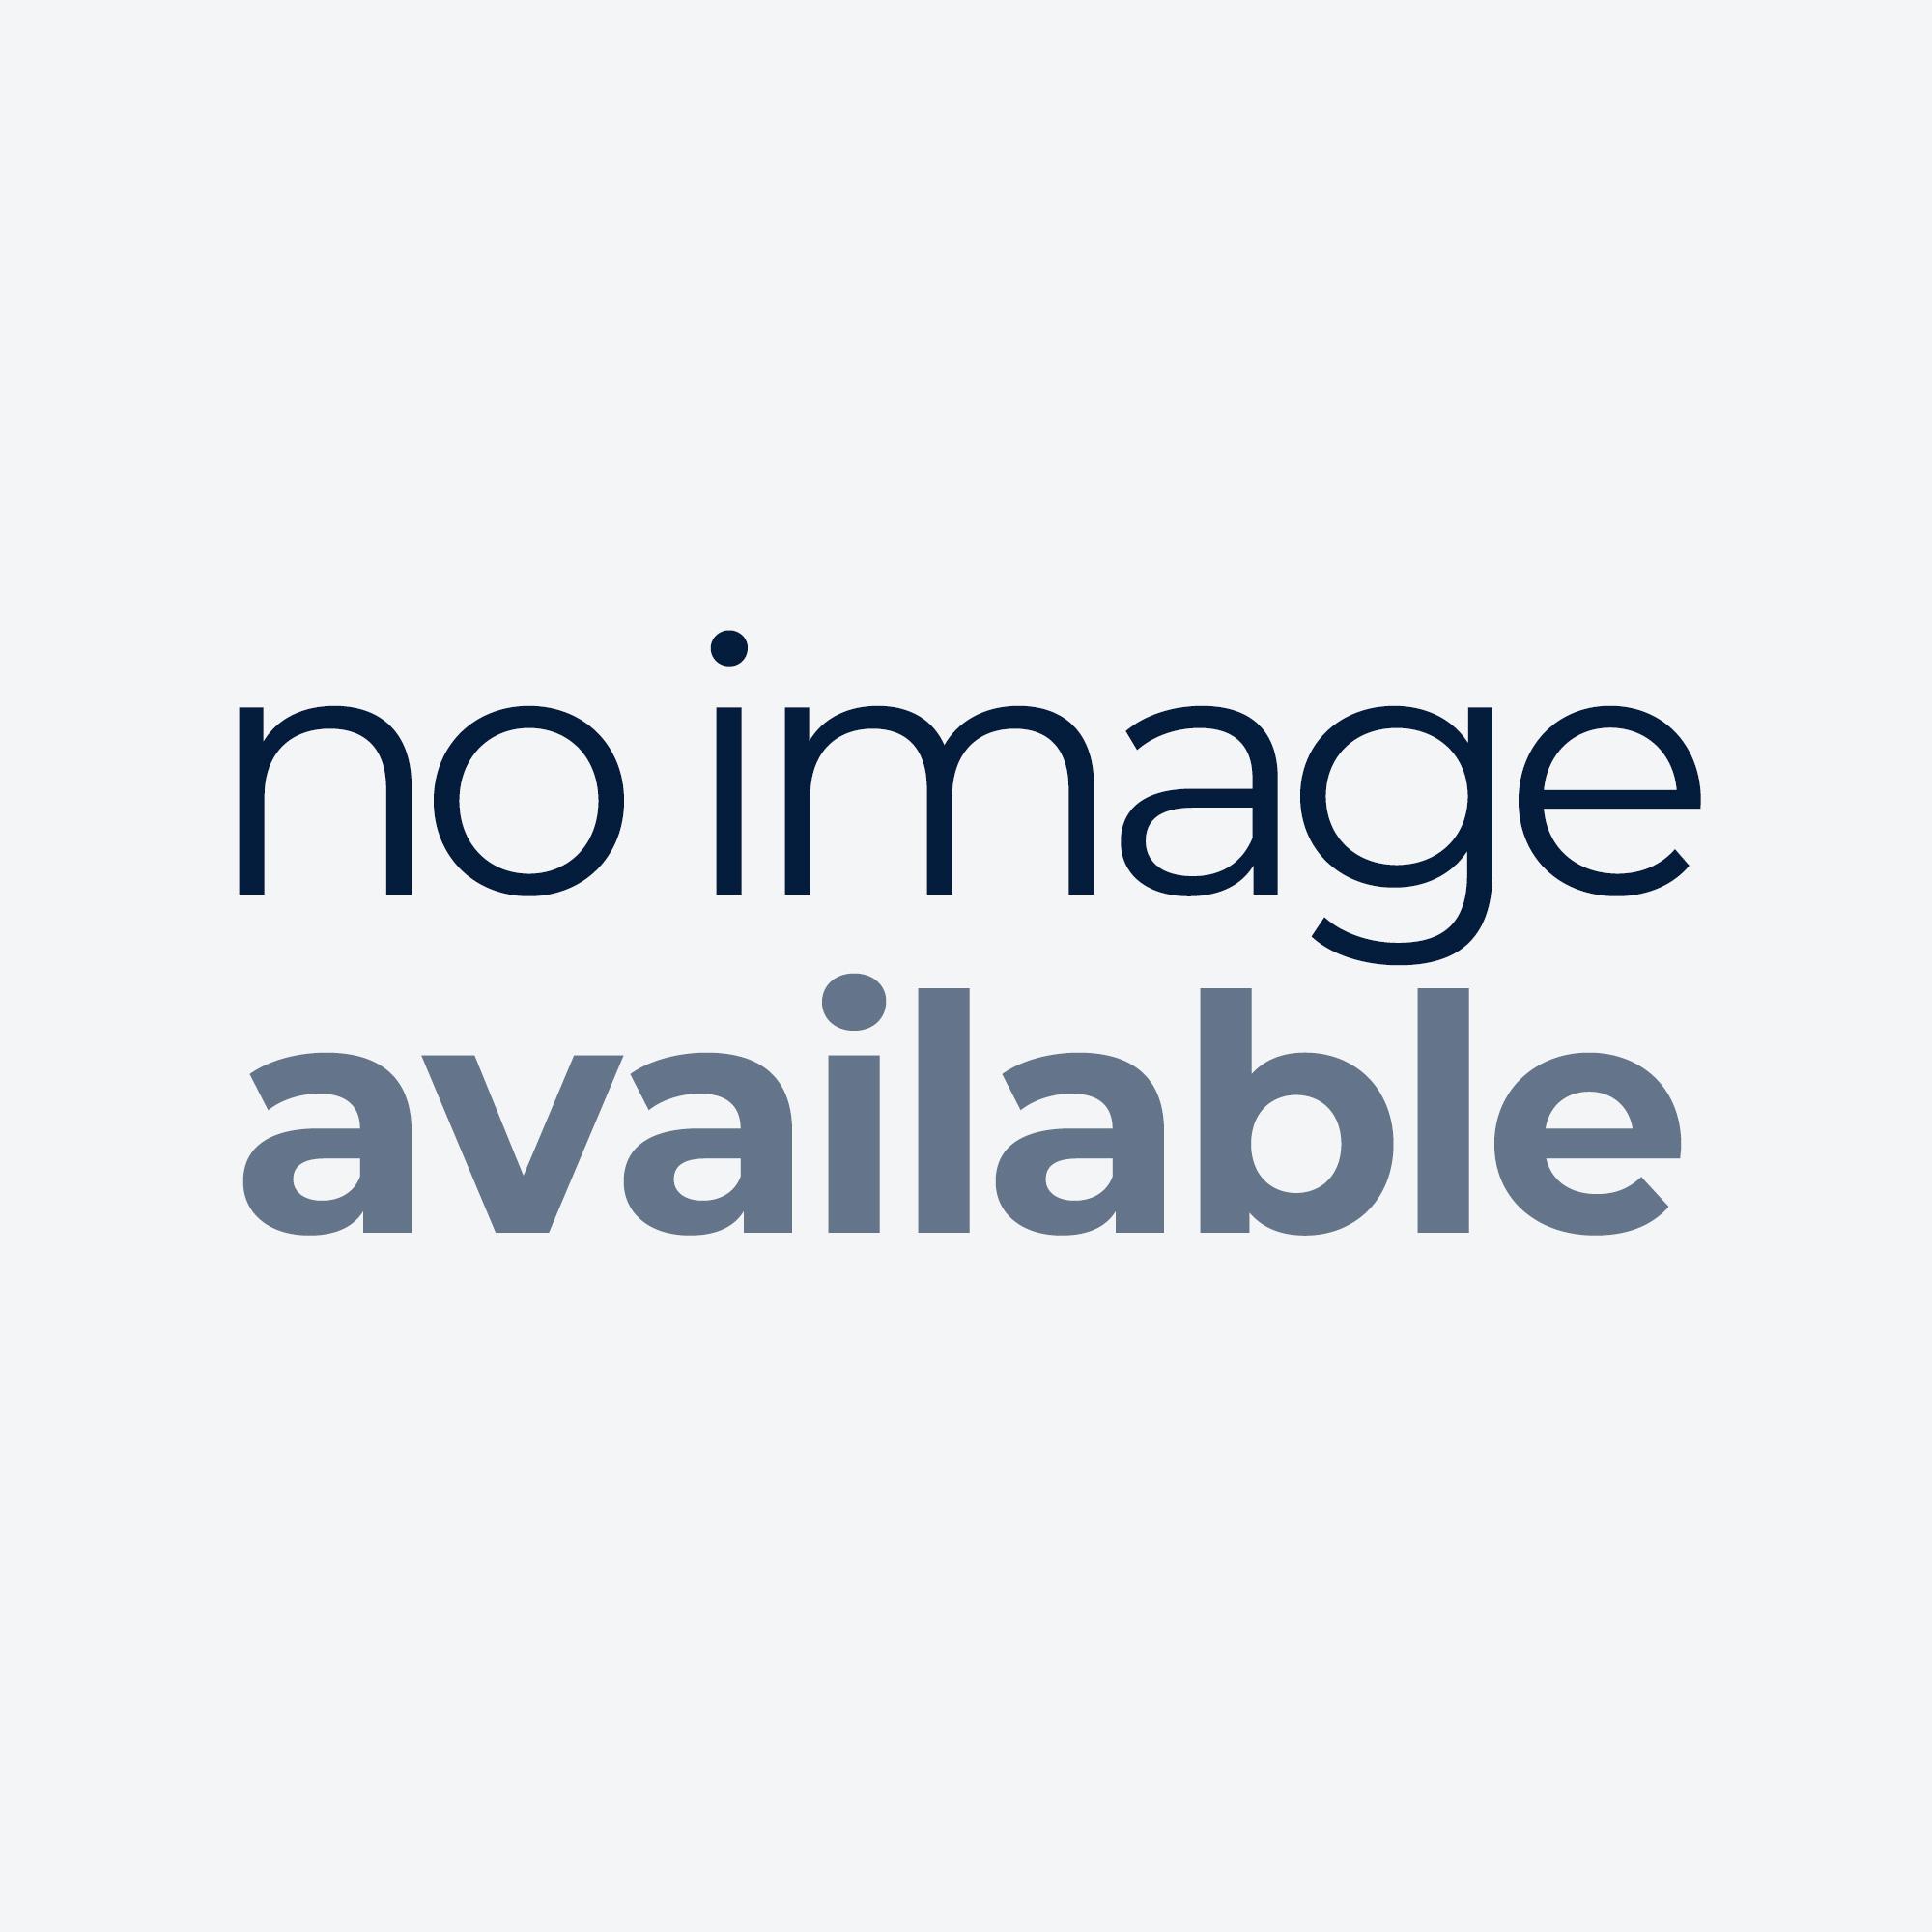 Astro lighting denia 2 light bathroom ceiling fitting in polished chrome finish astro lighting - Guide massive bathroom lighting optimum illumination ...